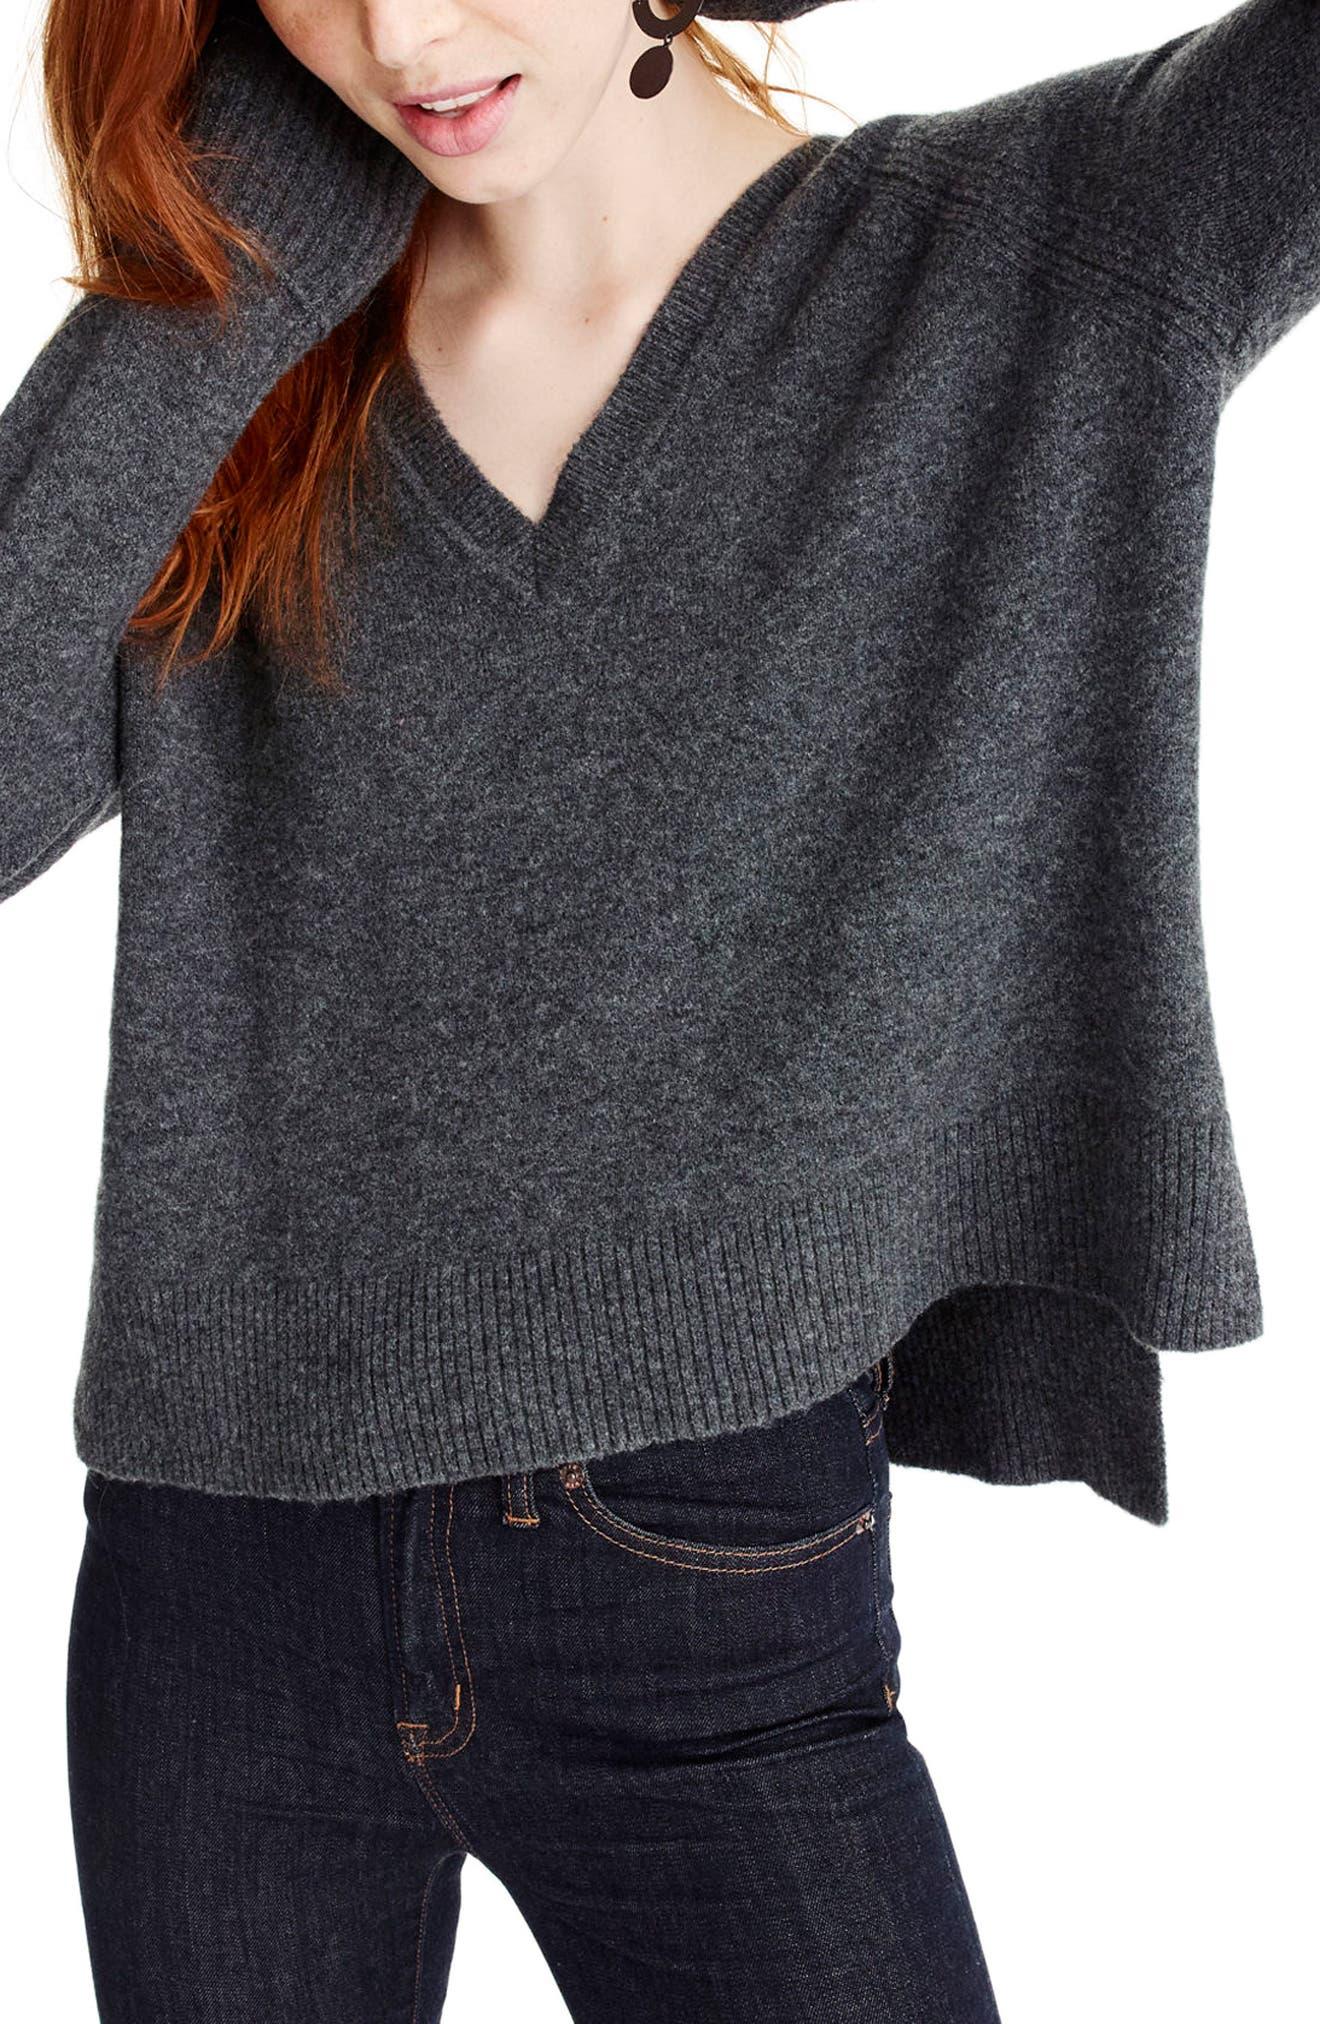 Alternate Image 1 Selected - J.Crew Supersoft Yarn V-Neck Sweater